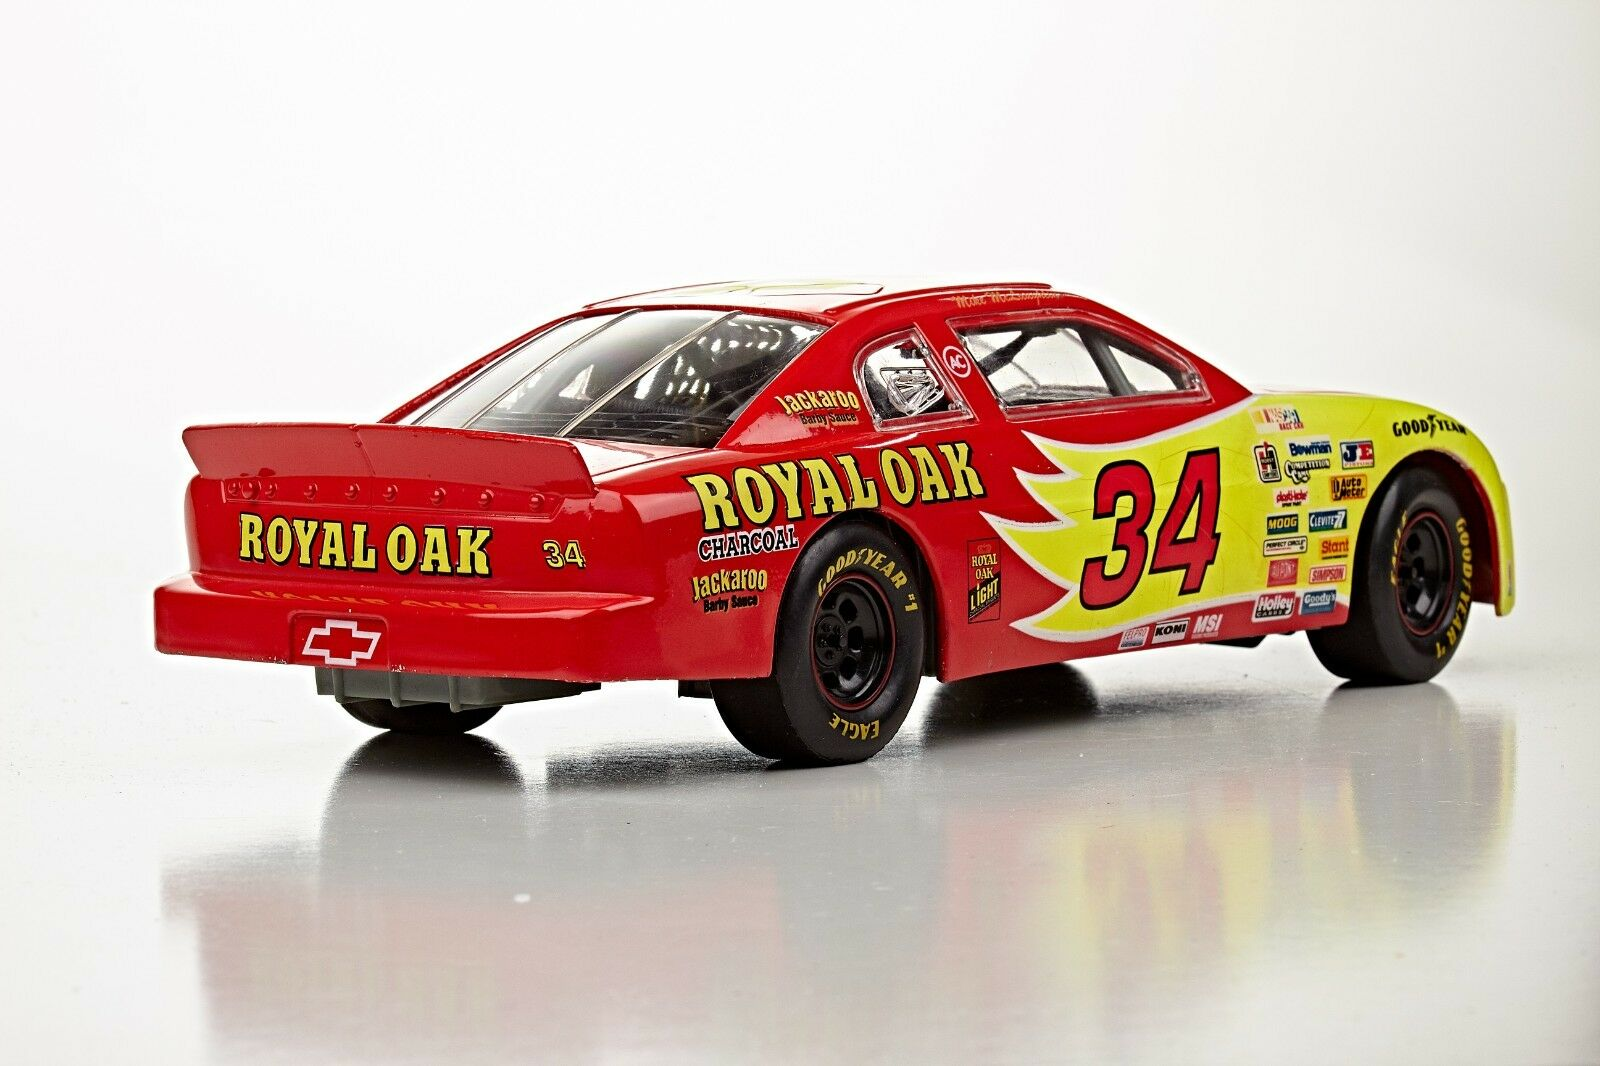 -1 18 18 18 Racing Champions 1996 Nascar Royal Oak charcoal  car 2381e5